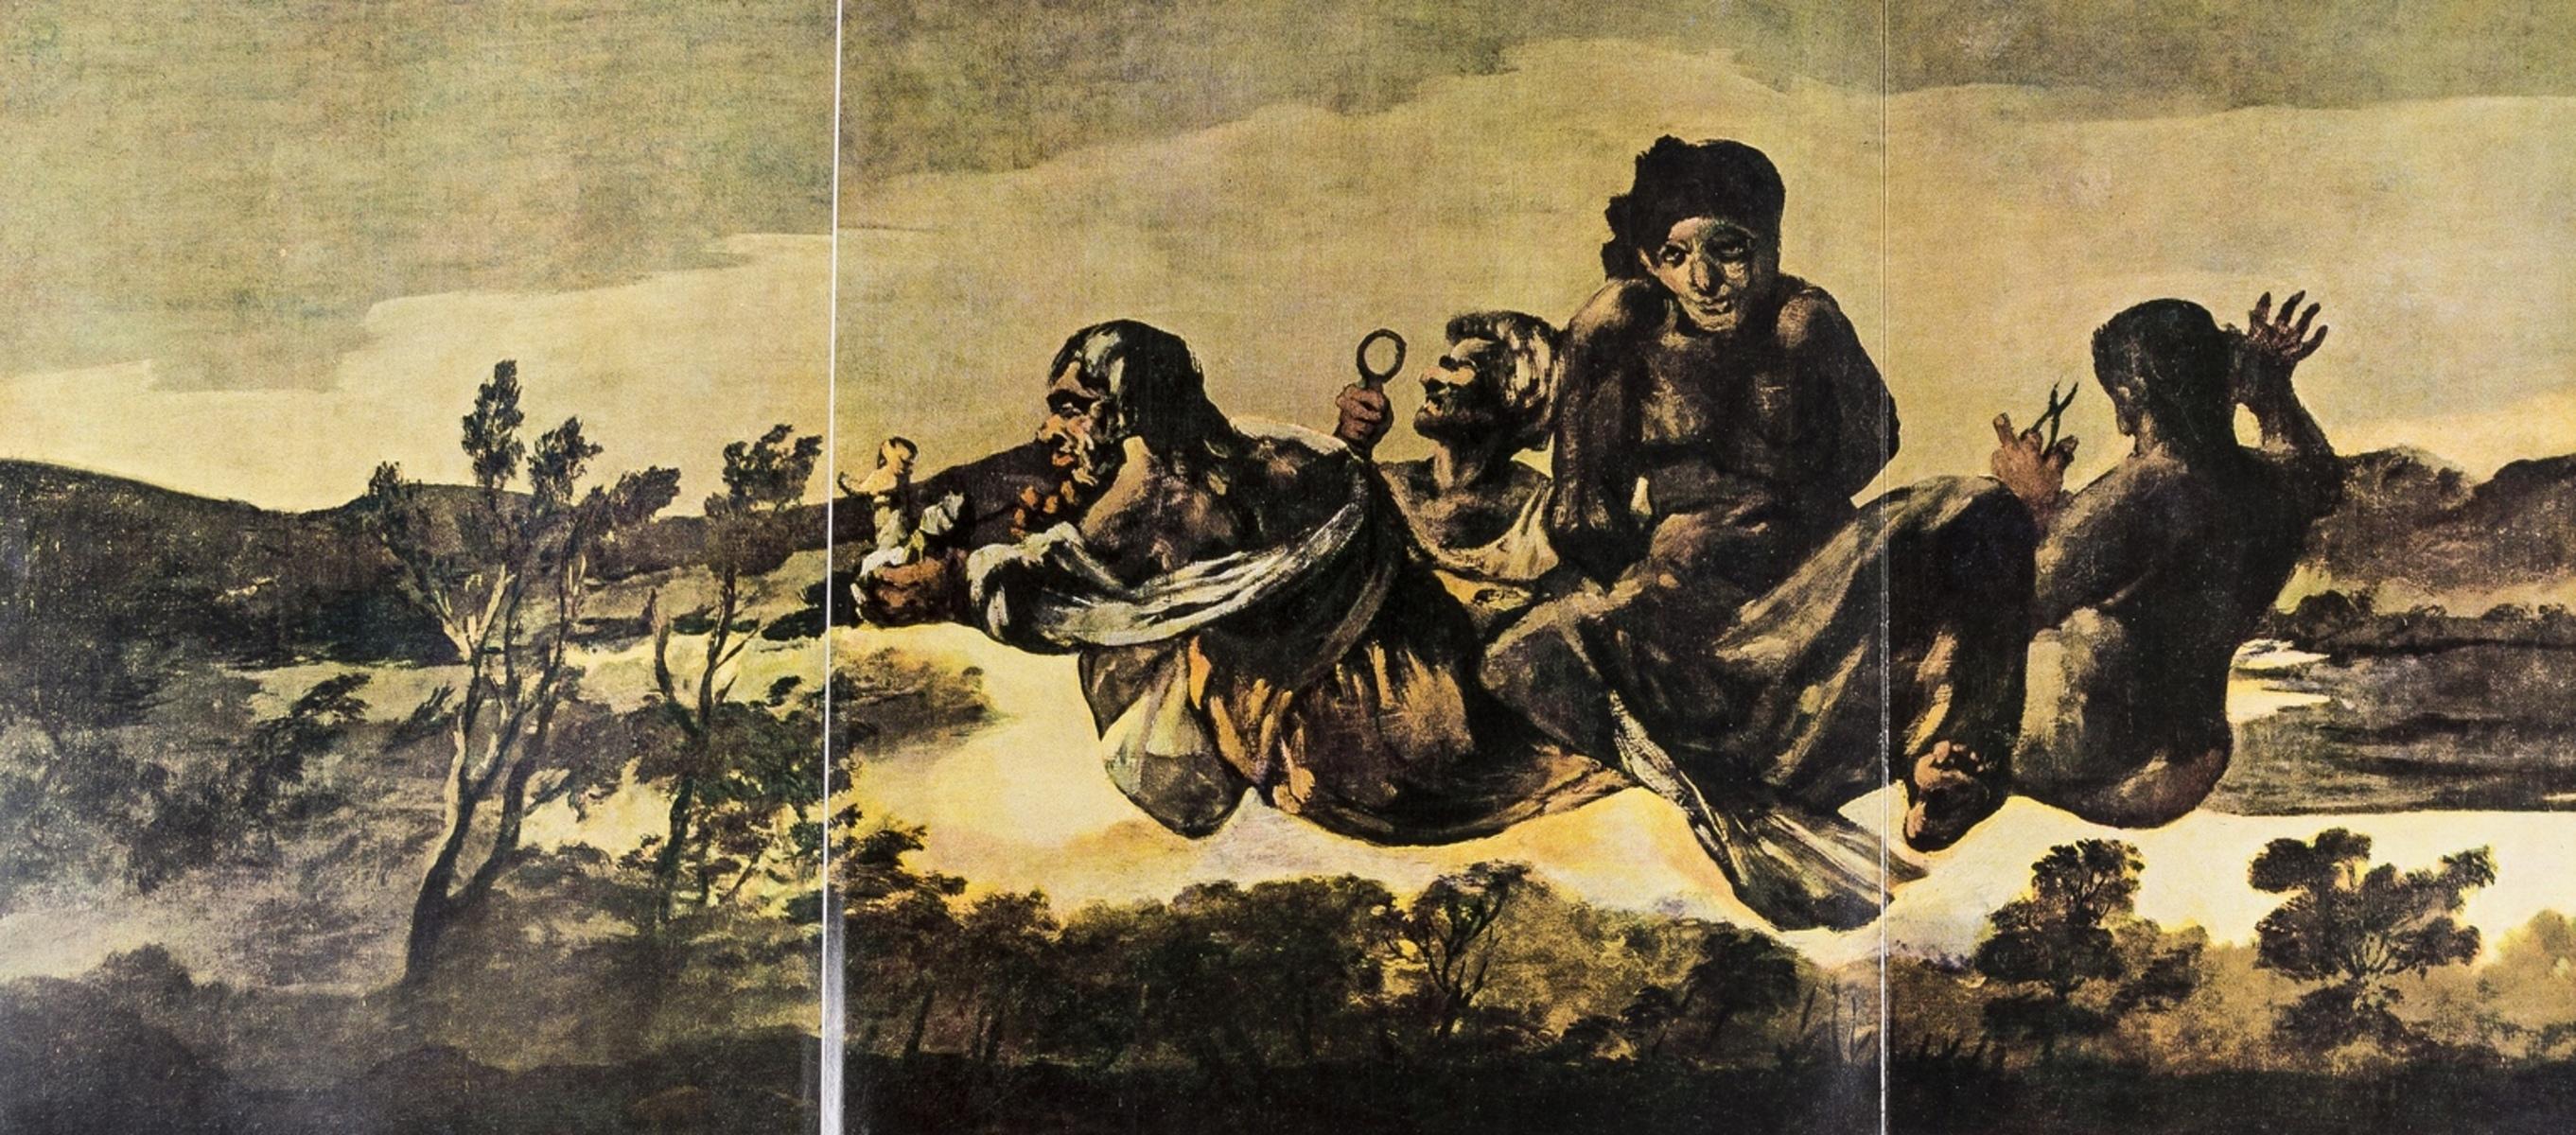 Canton (Francisco Javier Sanchez) Goya et ses Peintures Noires a la Quinta del Sordo, Milan & …